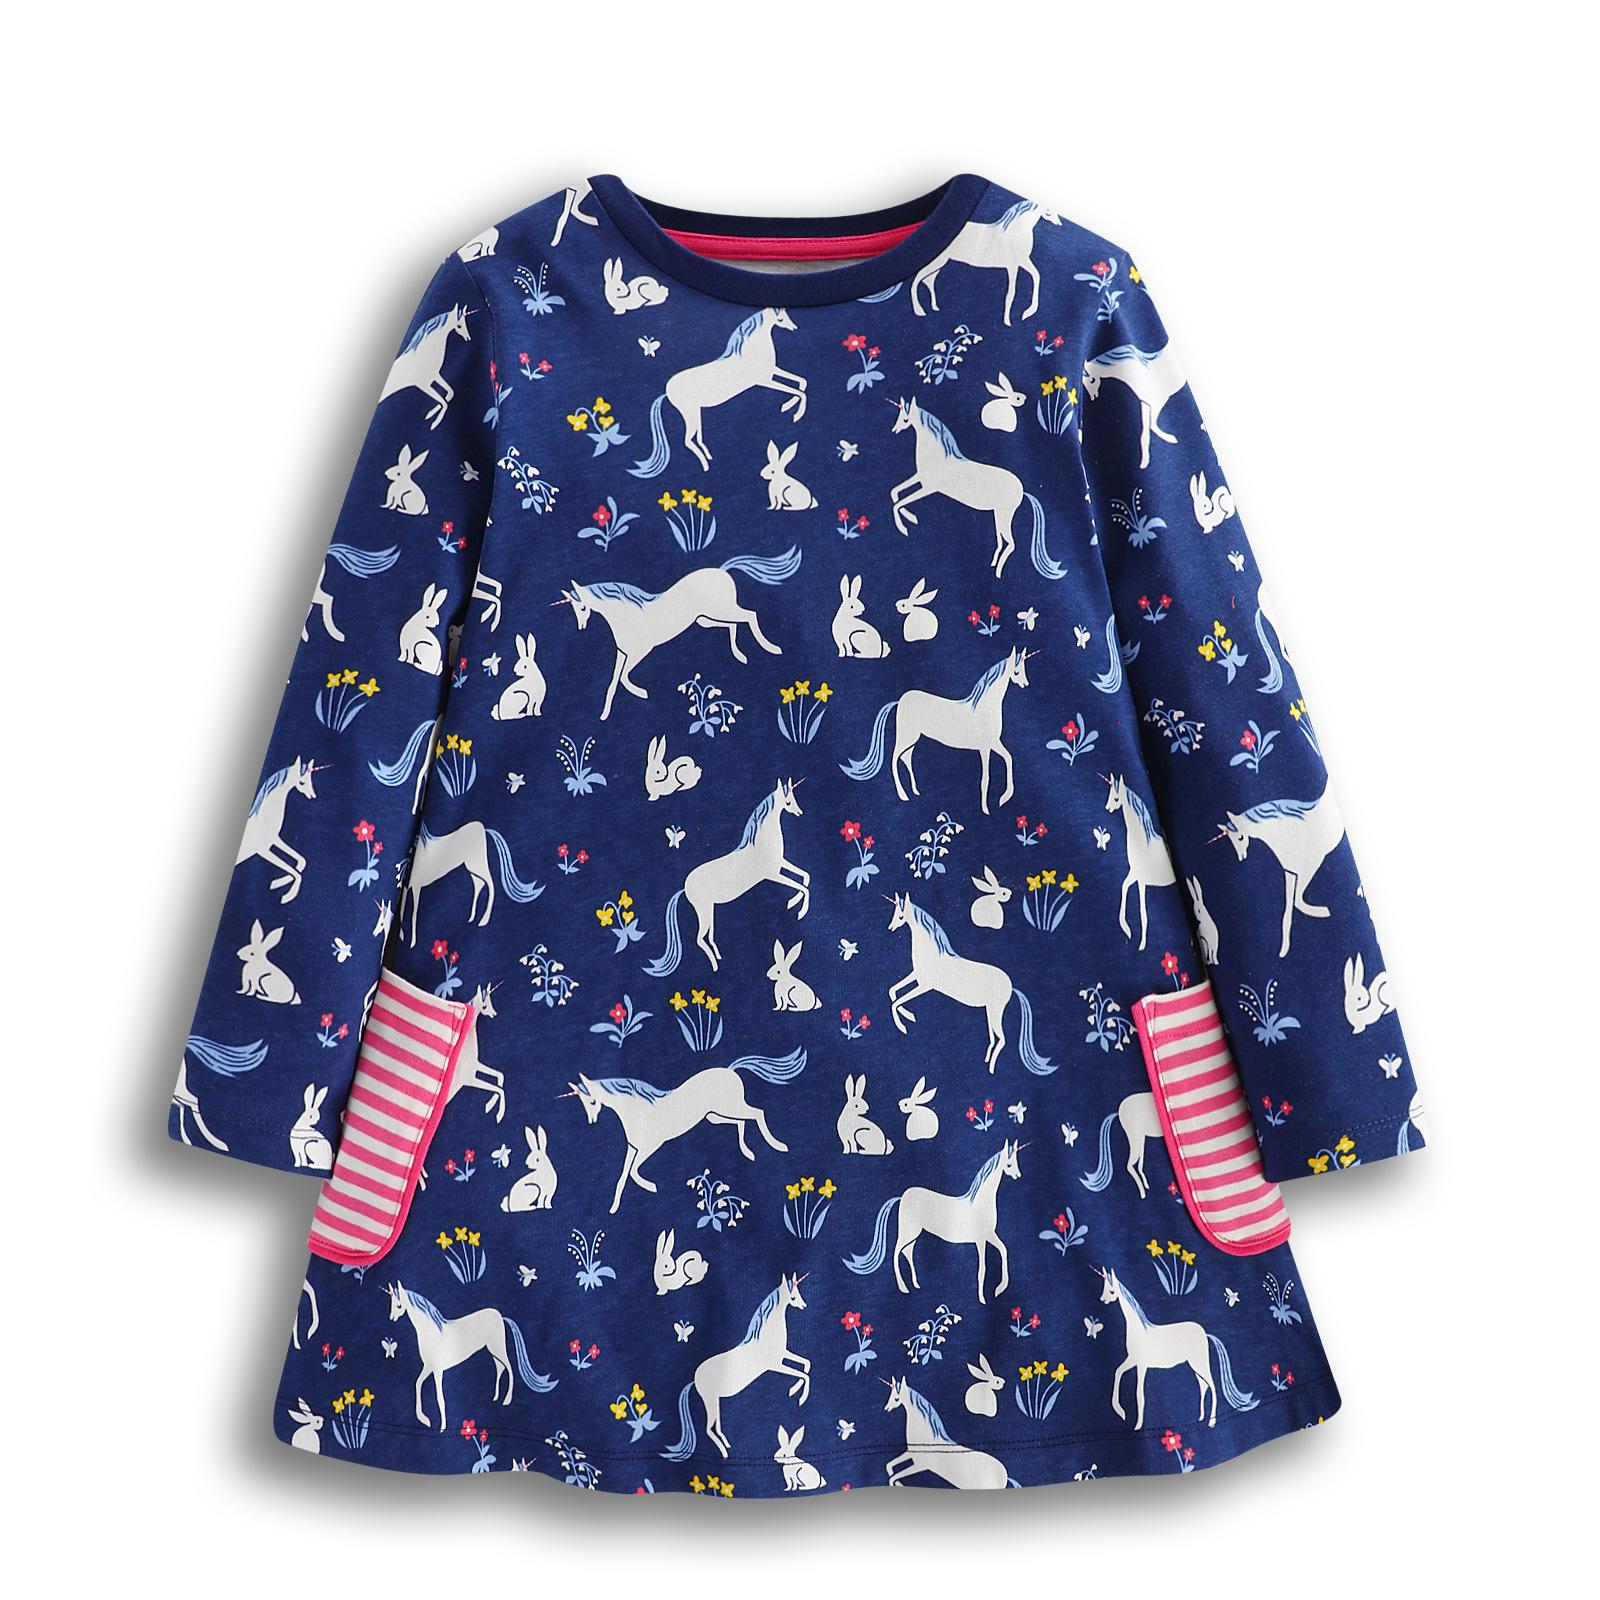 Kinder Mädchen Baumwolle Kleid T-Shirt Top Langarm Tunika ...